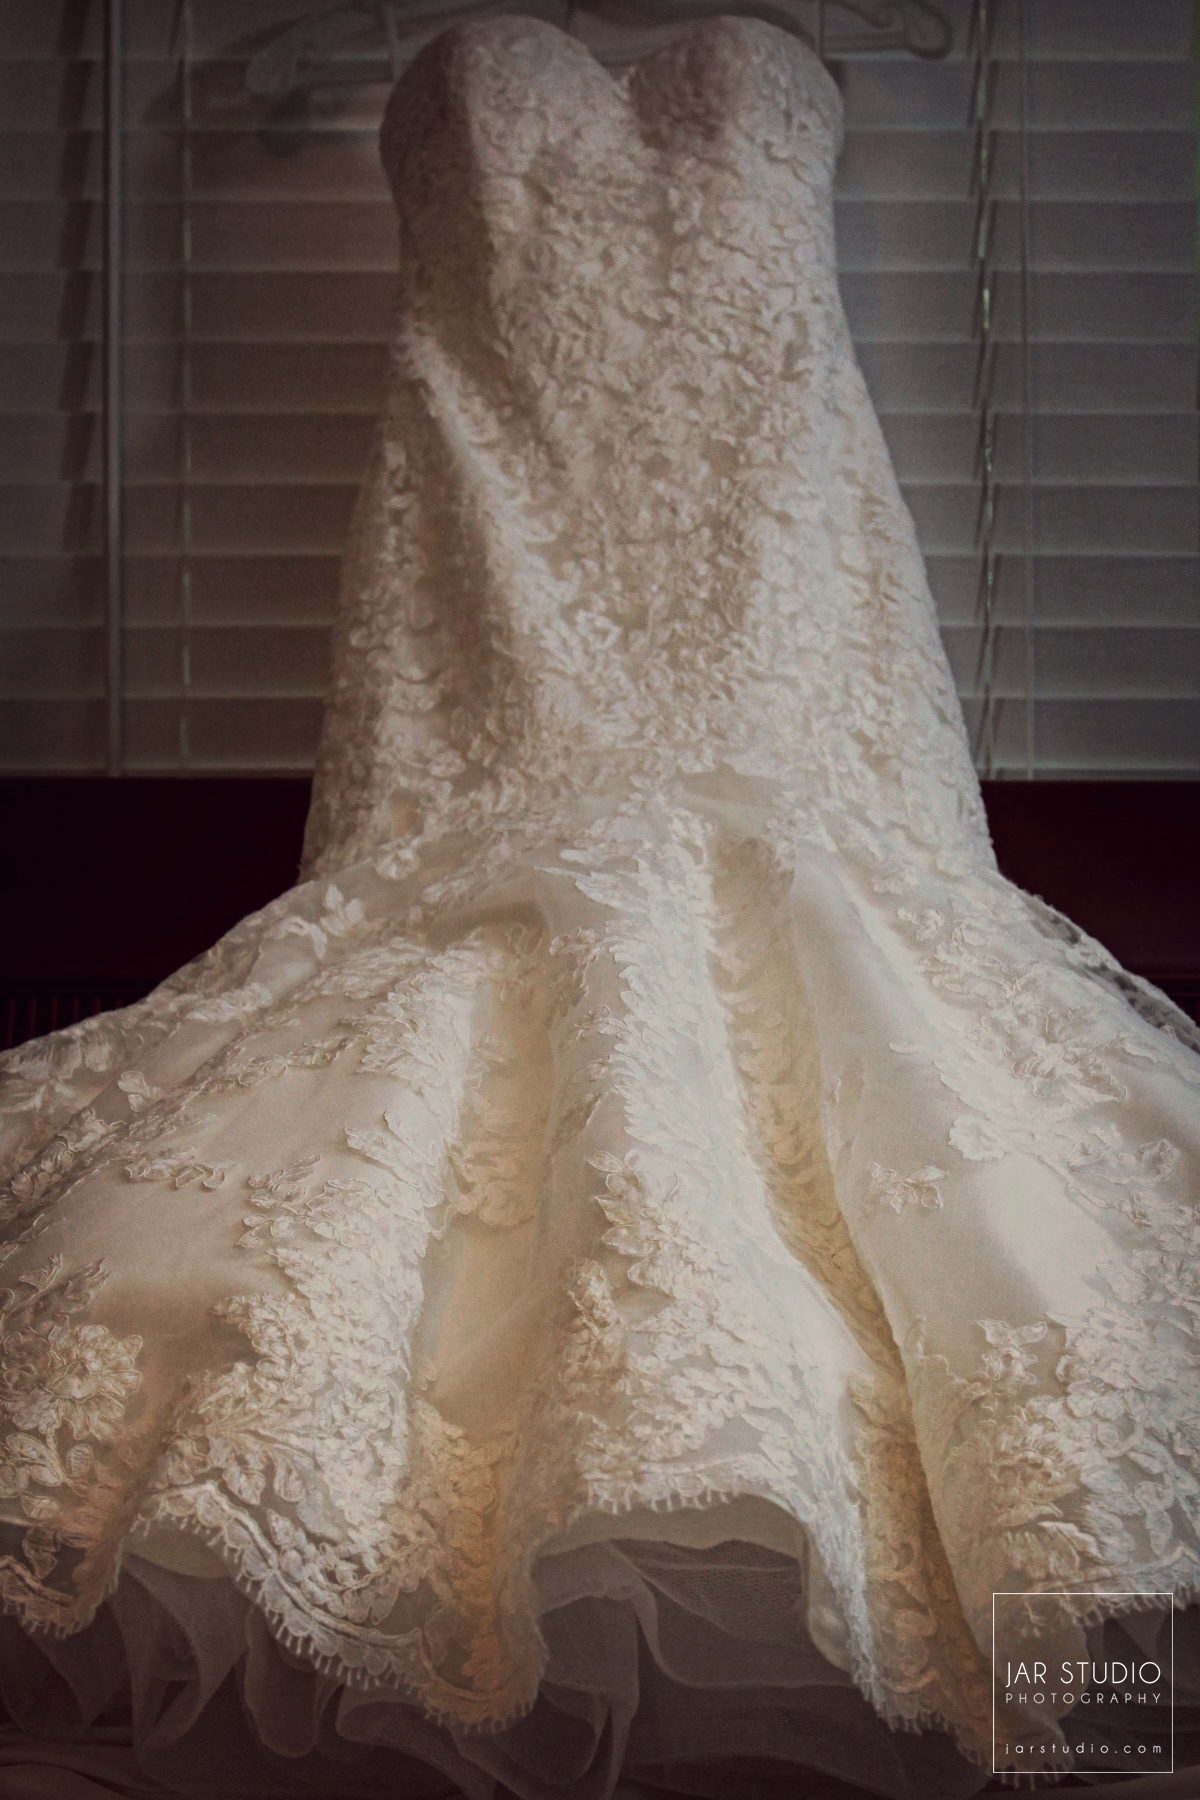 02-wedding-dress-details-jarstudio-photography.JPG